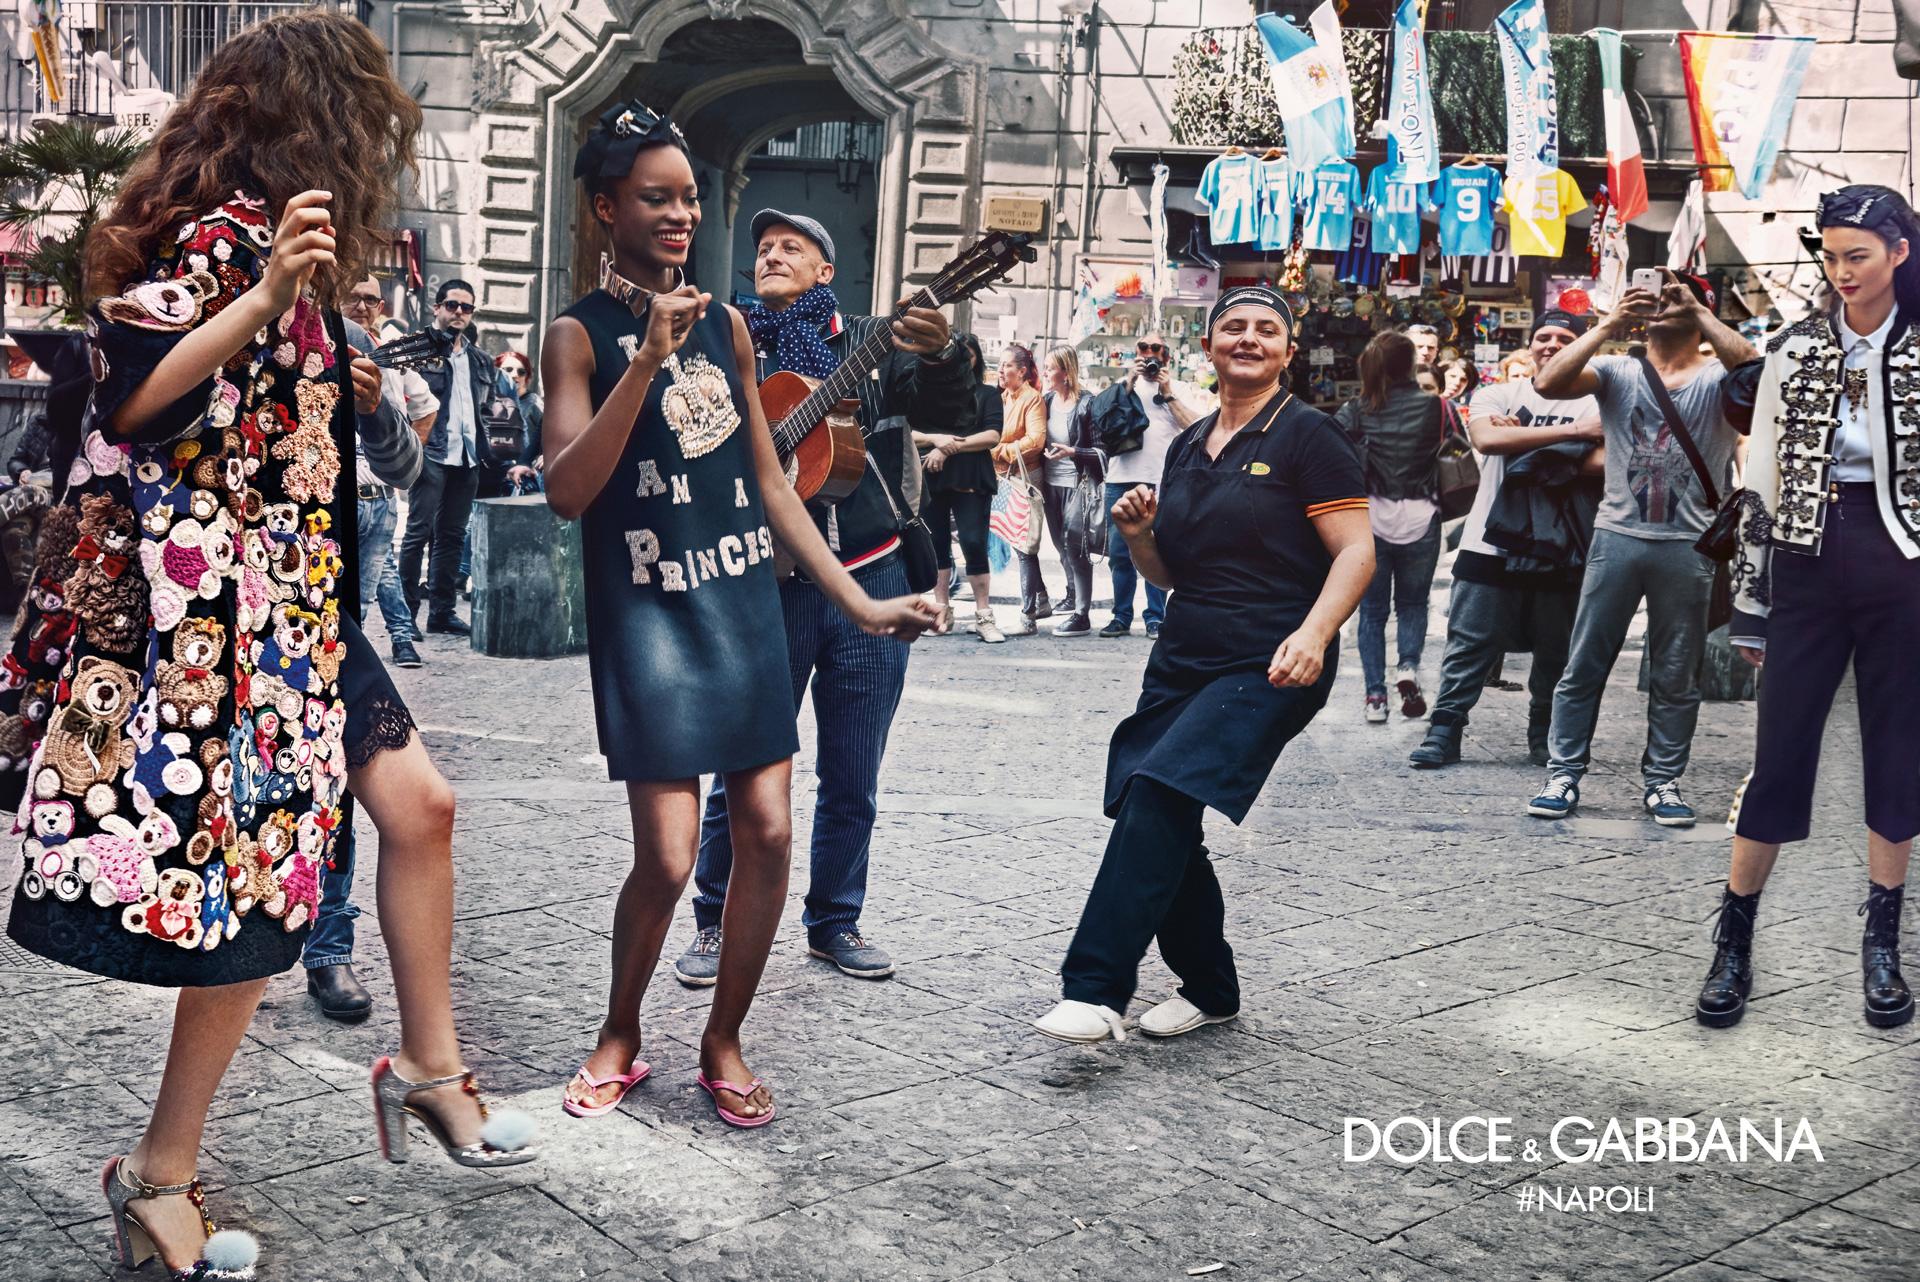 Dolce-Gabbana-Fall-Winter-2016-2017-Ad-Campaign-Naples-5